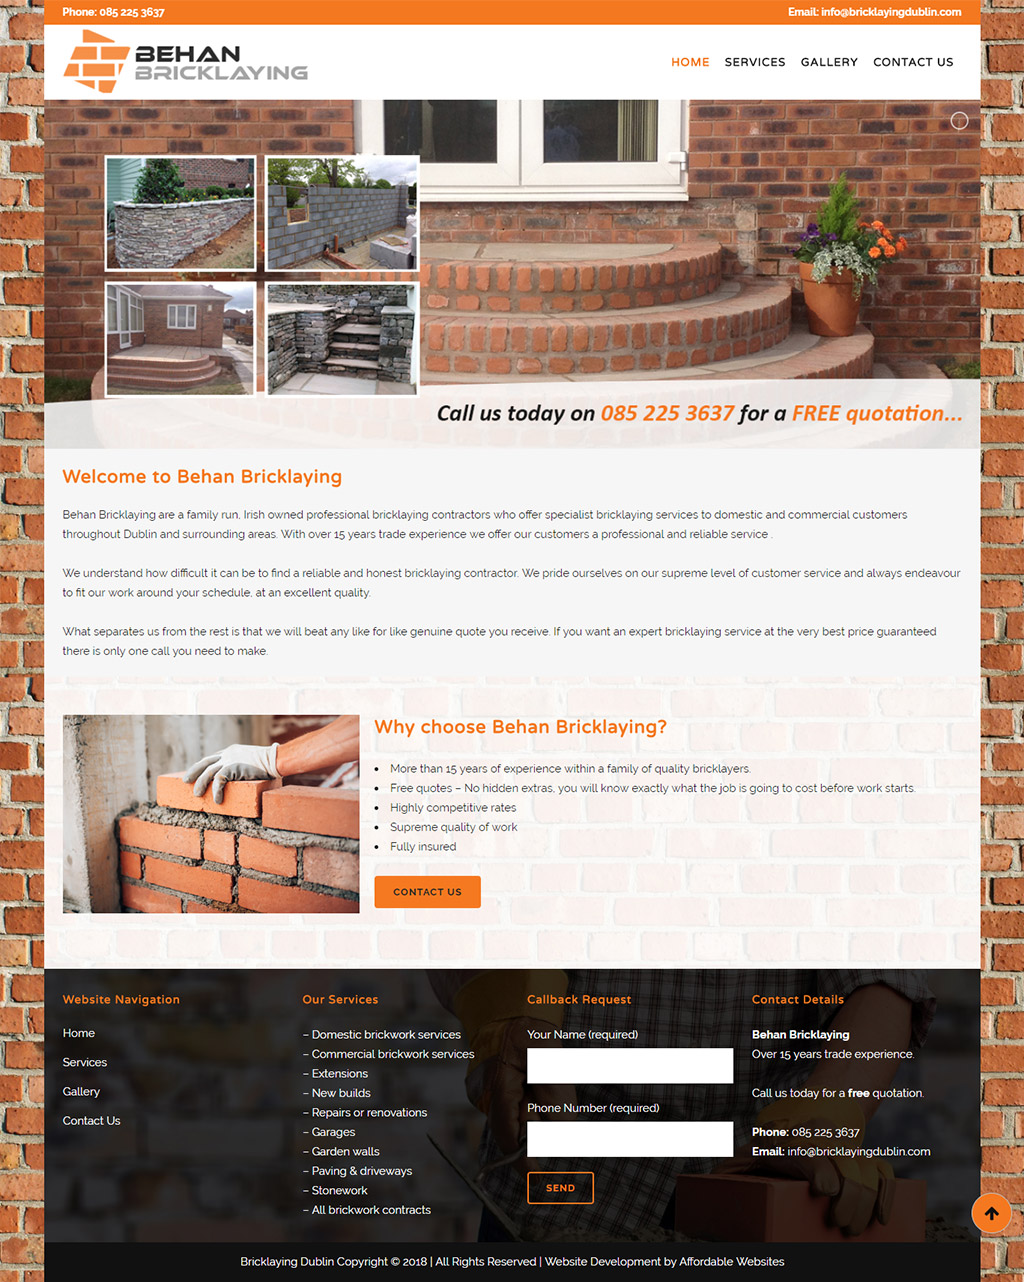 Behan Bricklaying website